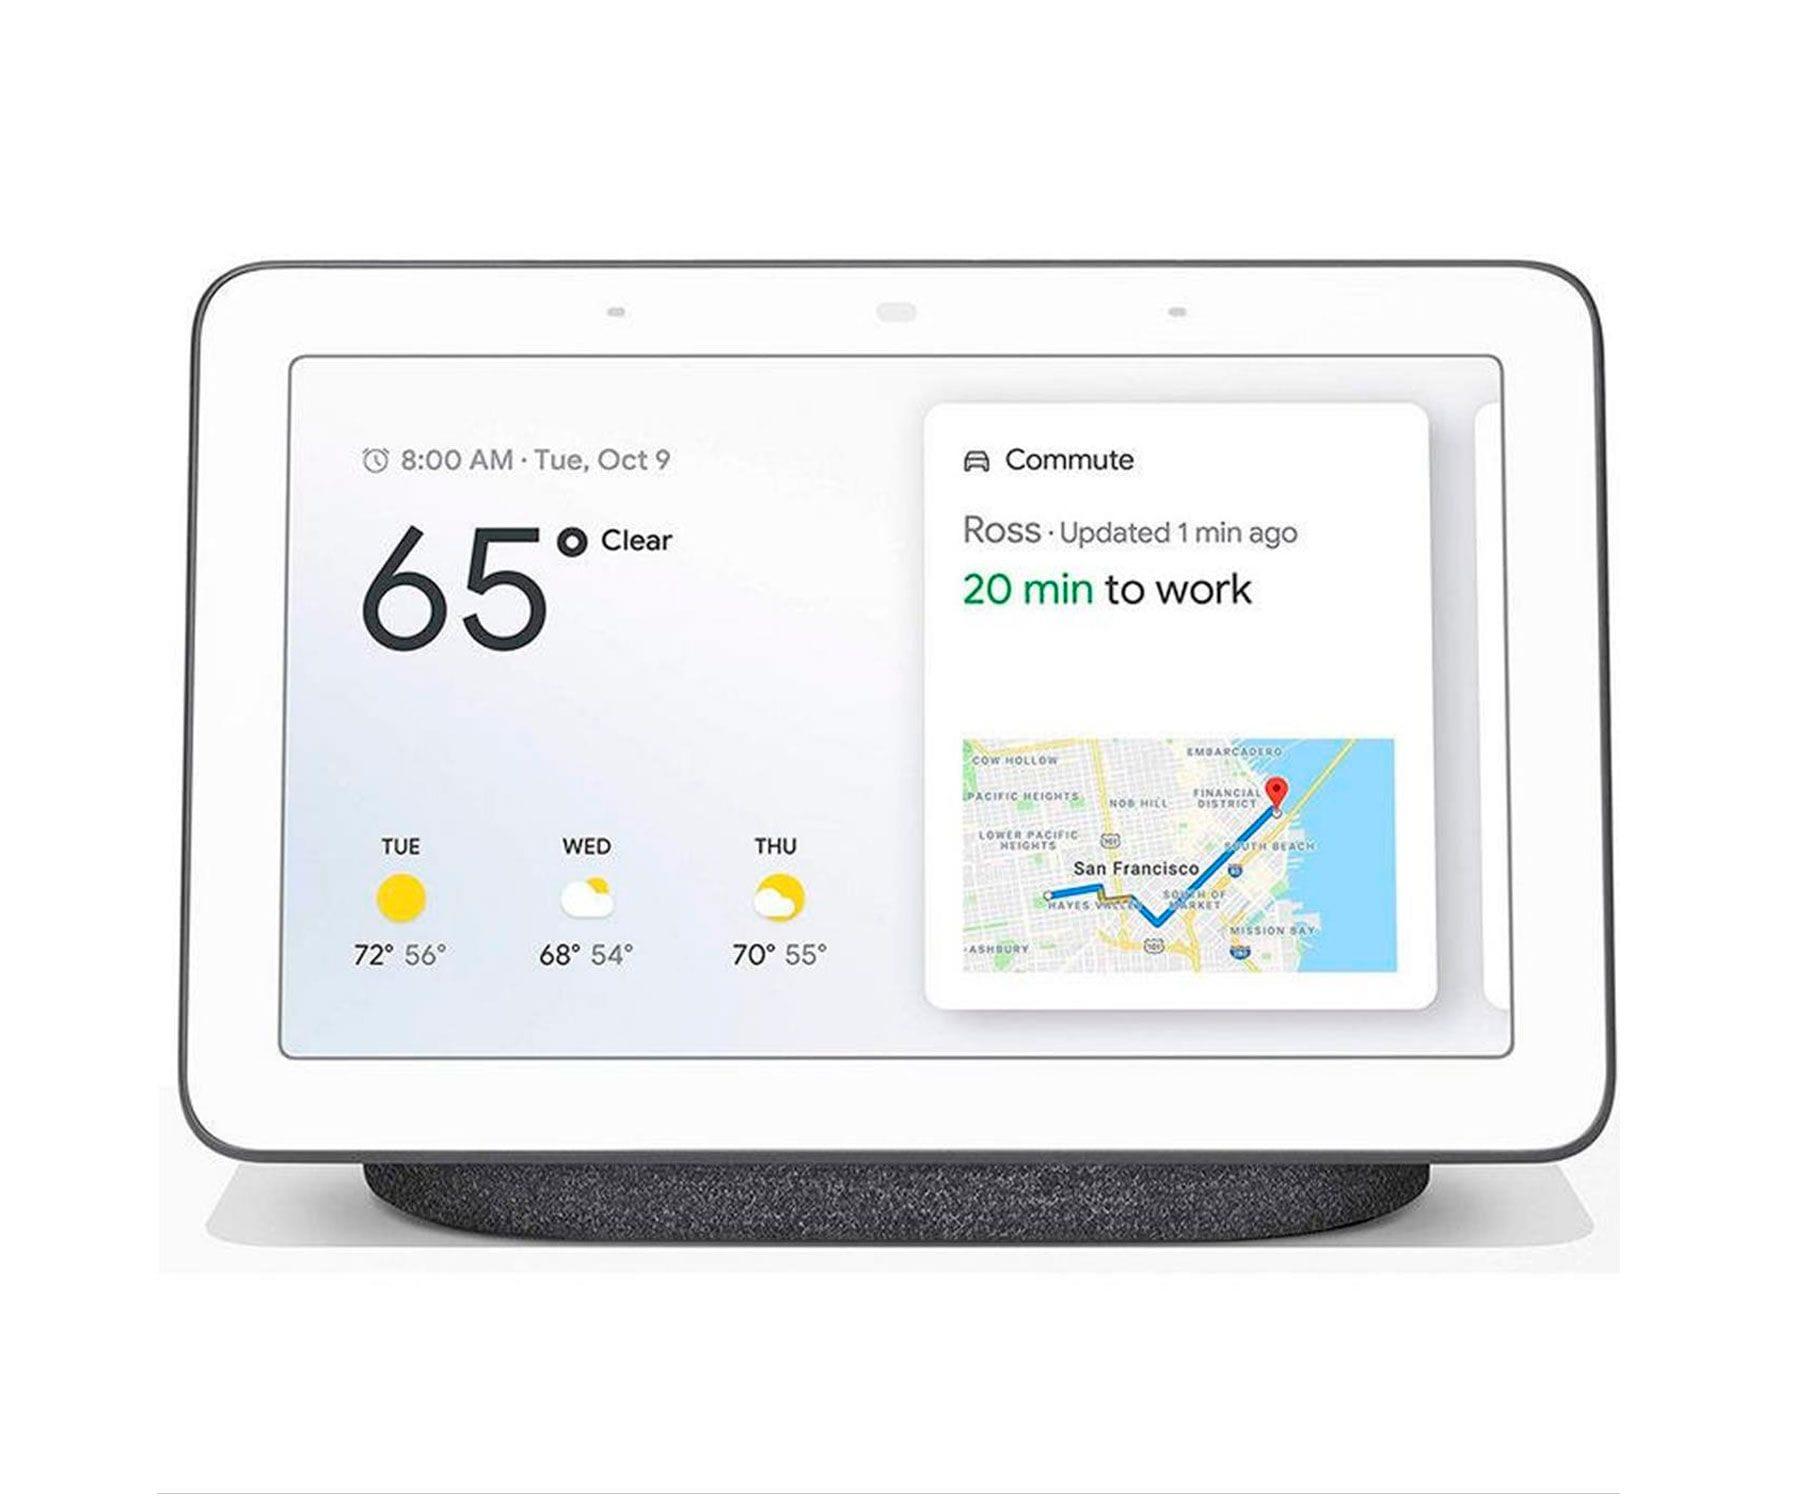 Google Nest Hub 2nd gen carbón (negro)/Pantalla táctil 7'' con altavoz Wifi/Asistente Google/Control de sueño*